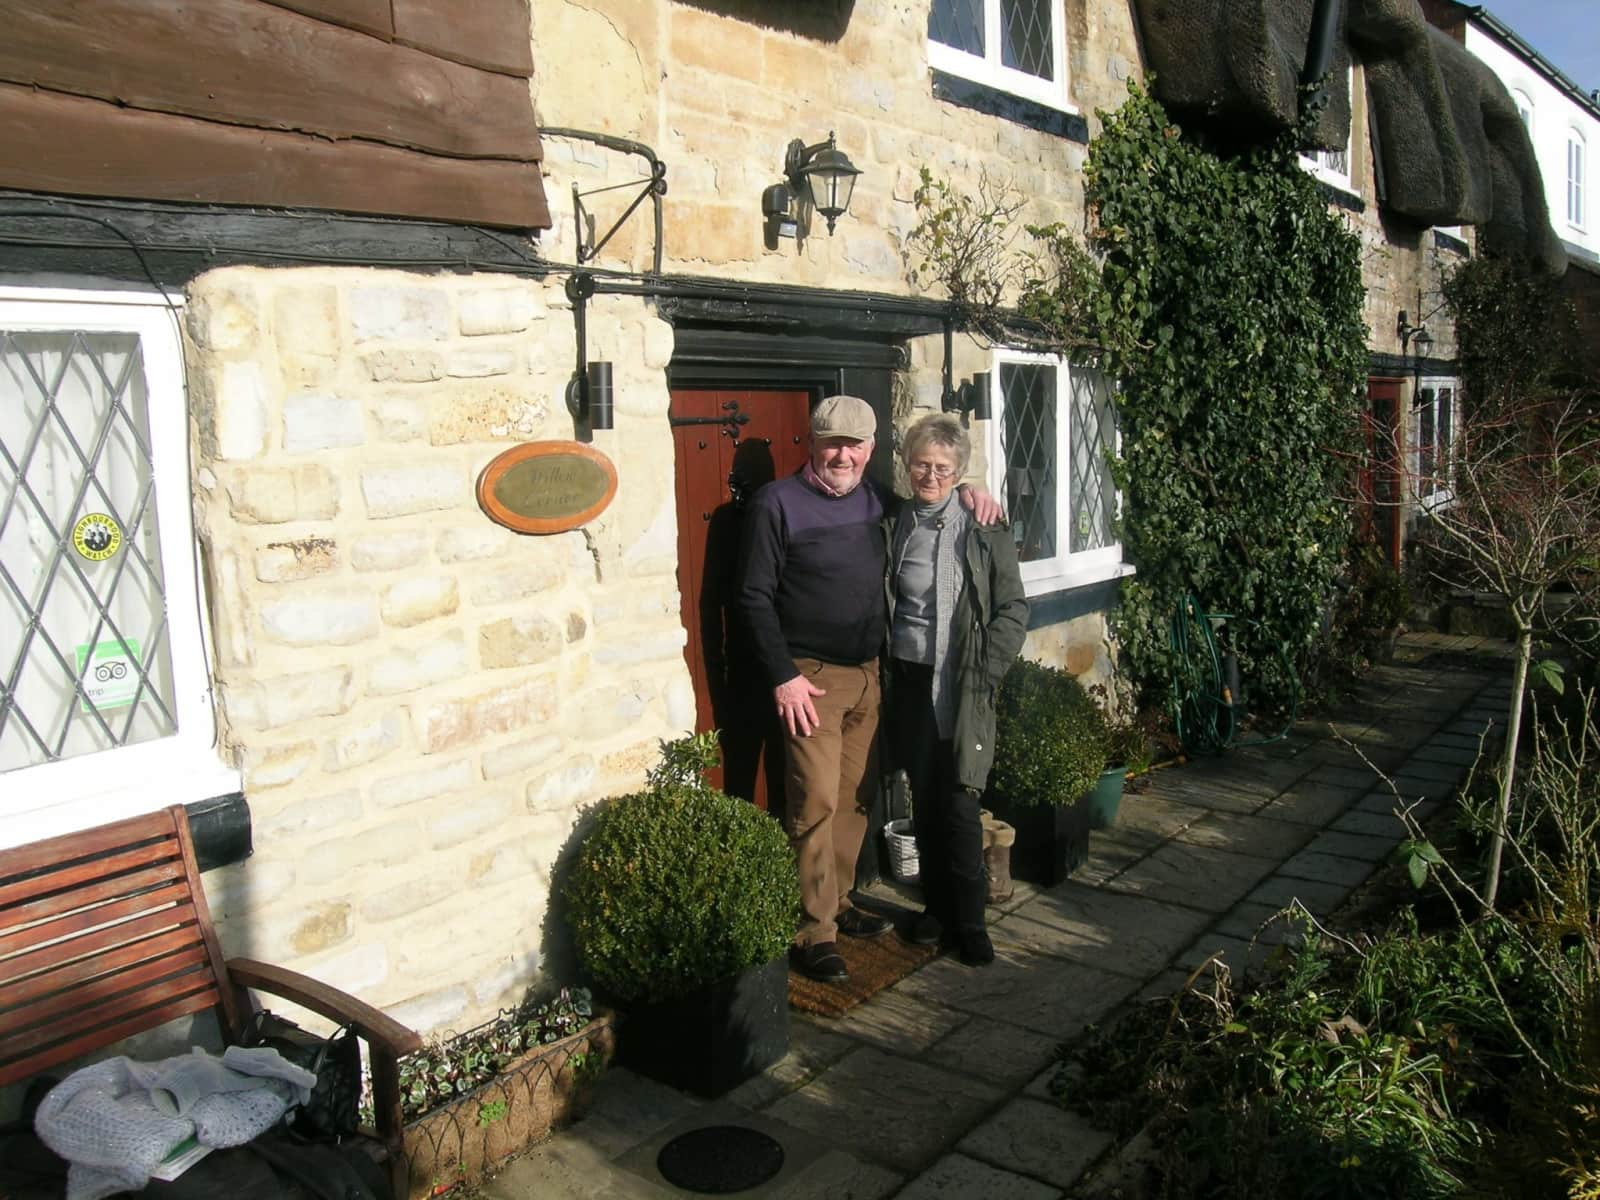 Malcolm & Lesley from York, United Kingdom